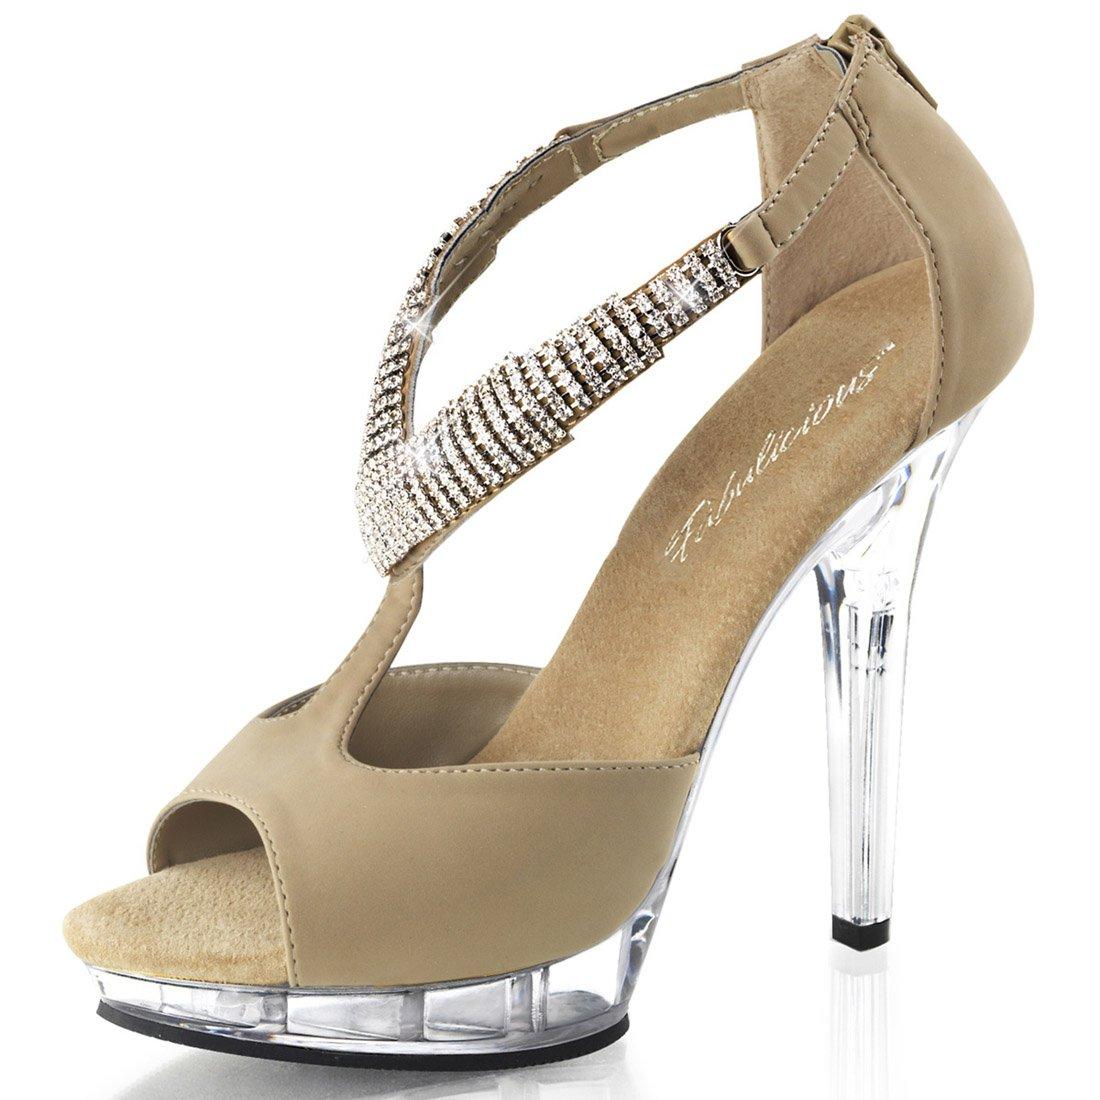 Summitfashions Soft Nubuck Tan Leather Sandals with Rhinestones and Clear 5 Inch Heels B00F99NHRU 9 B(M) US